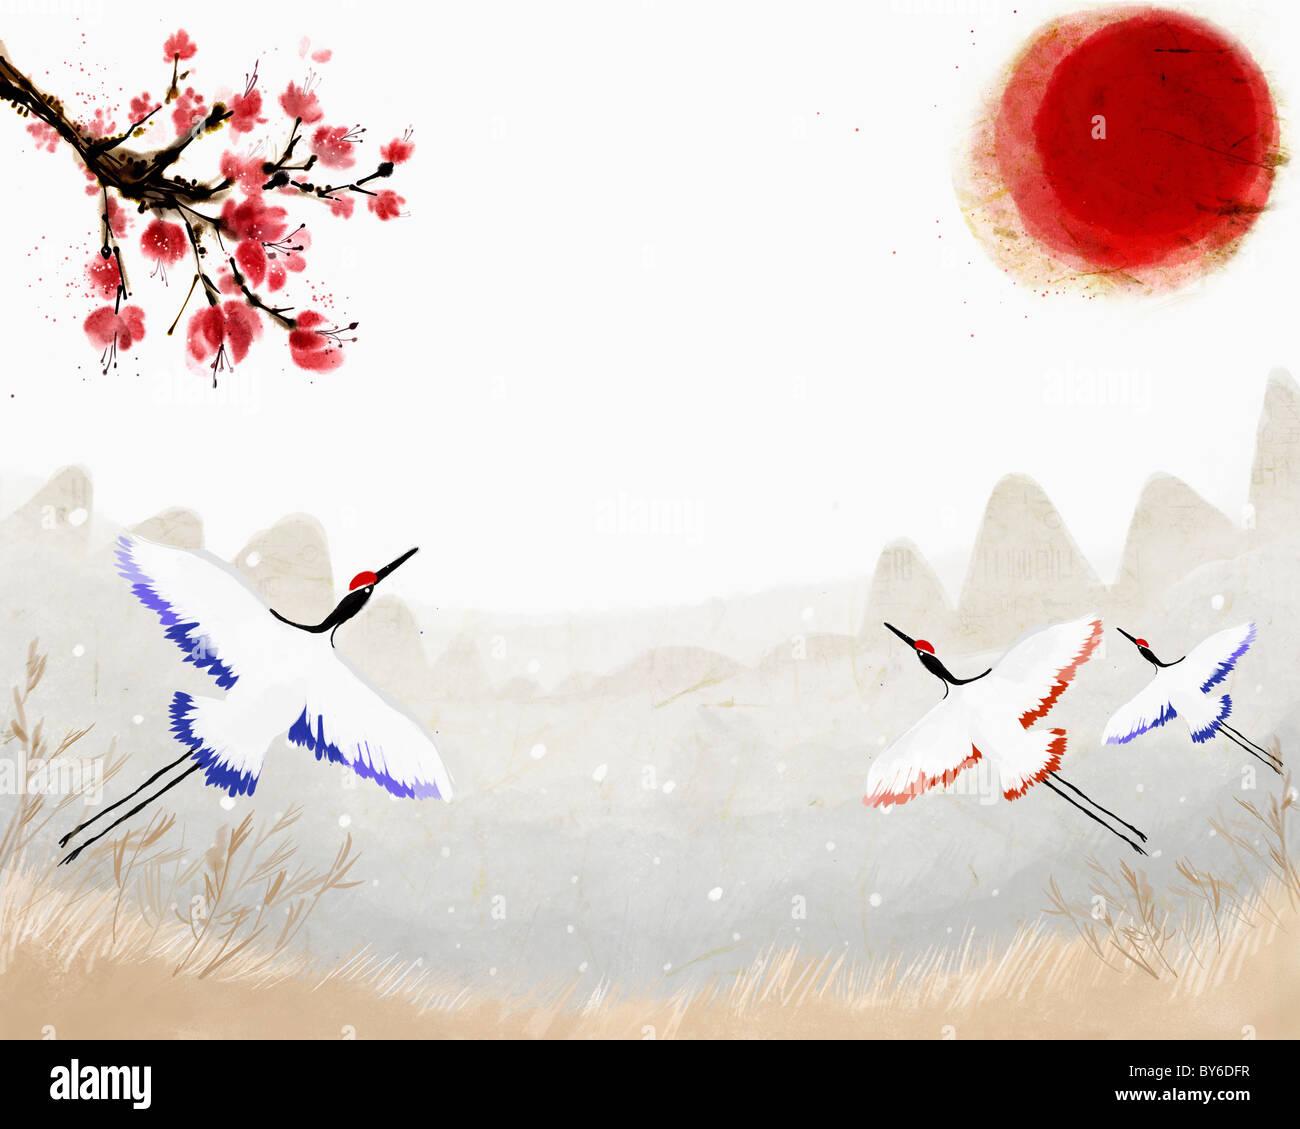 2013 lunar year illustration oriental mood - Stock Image